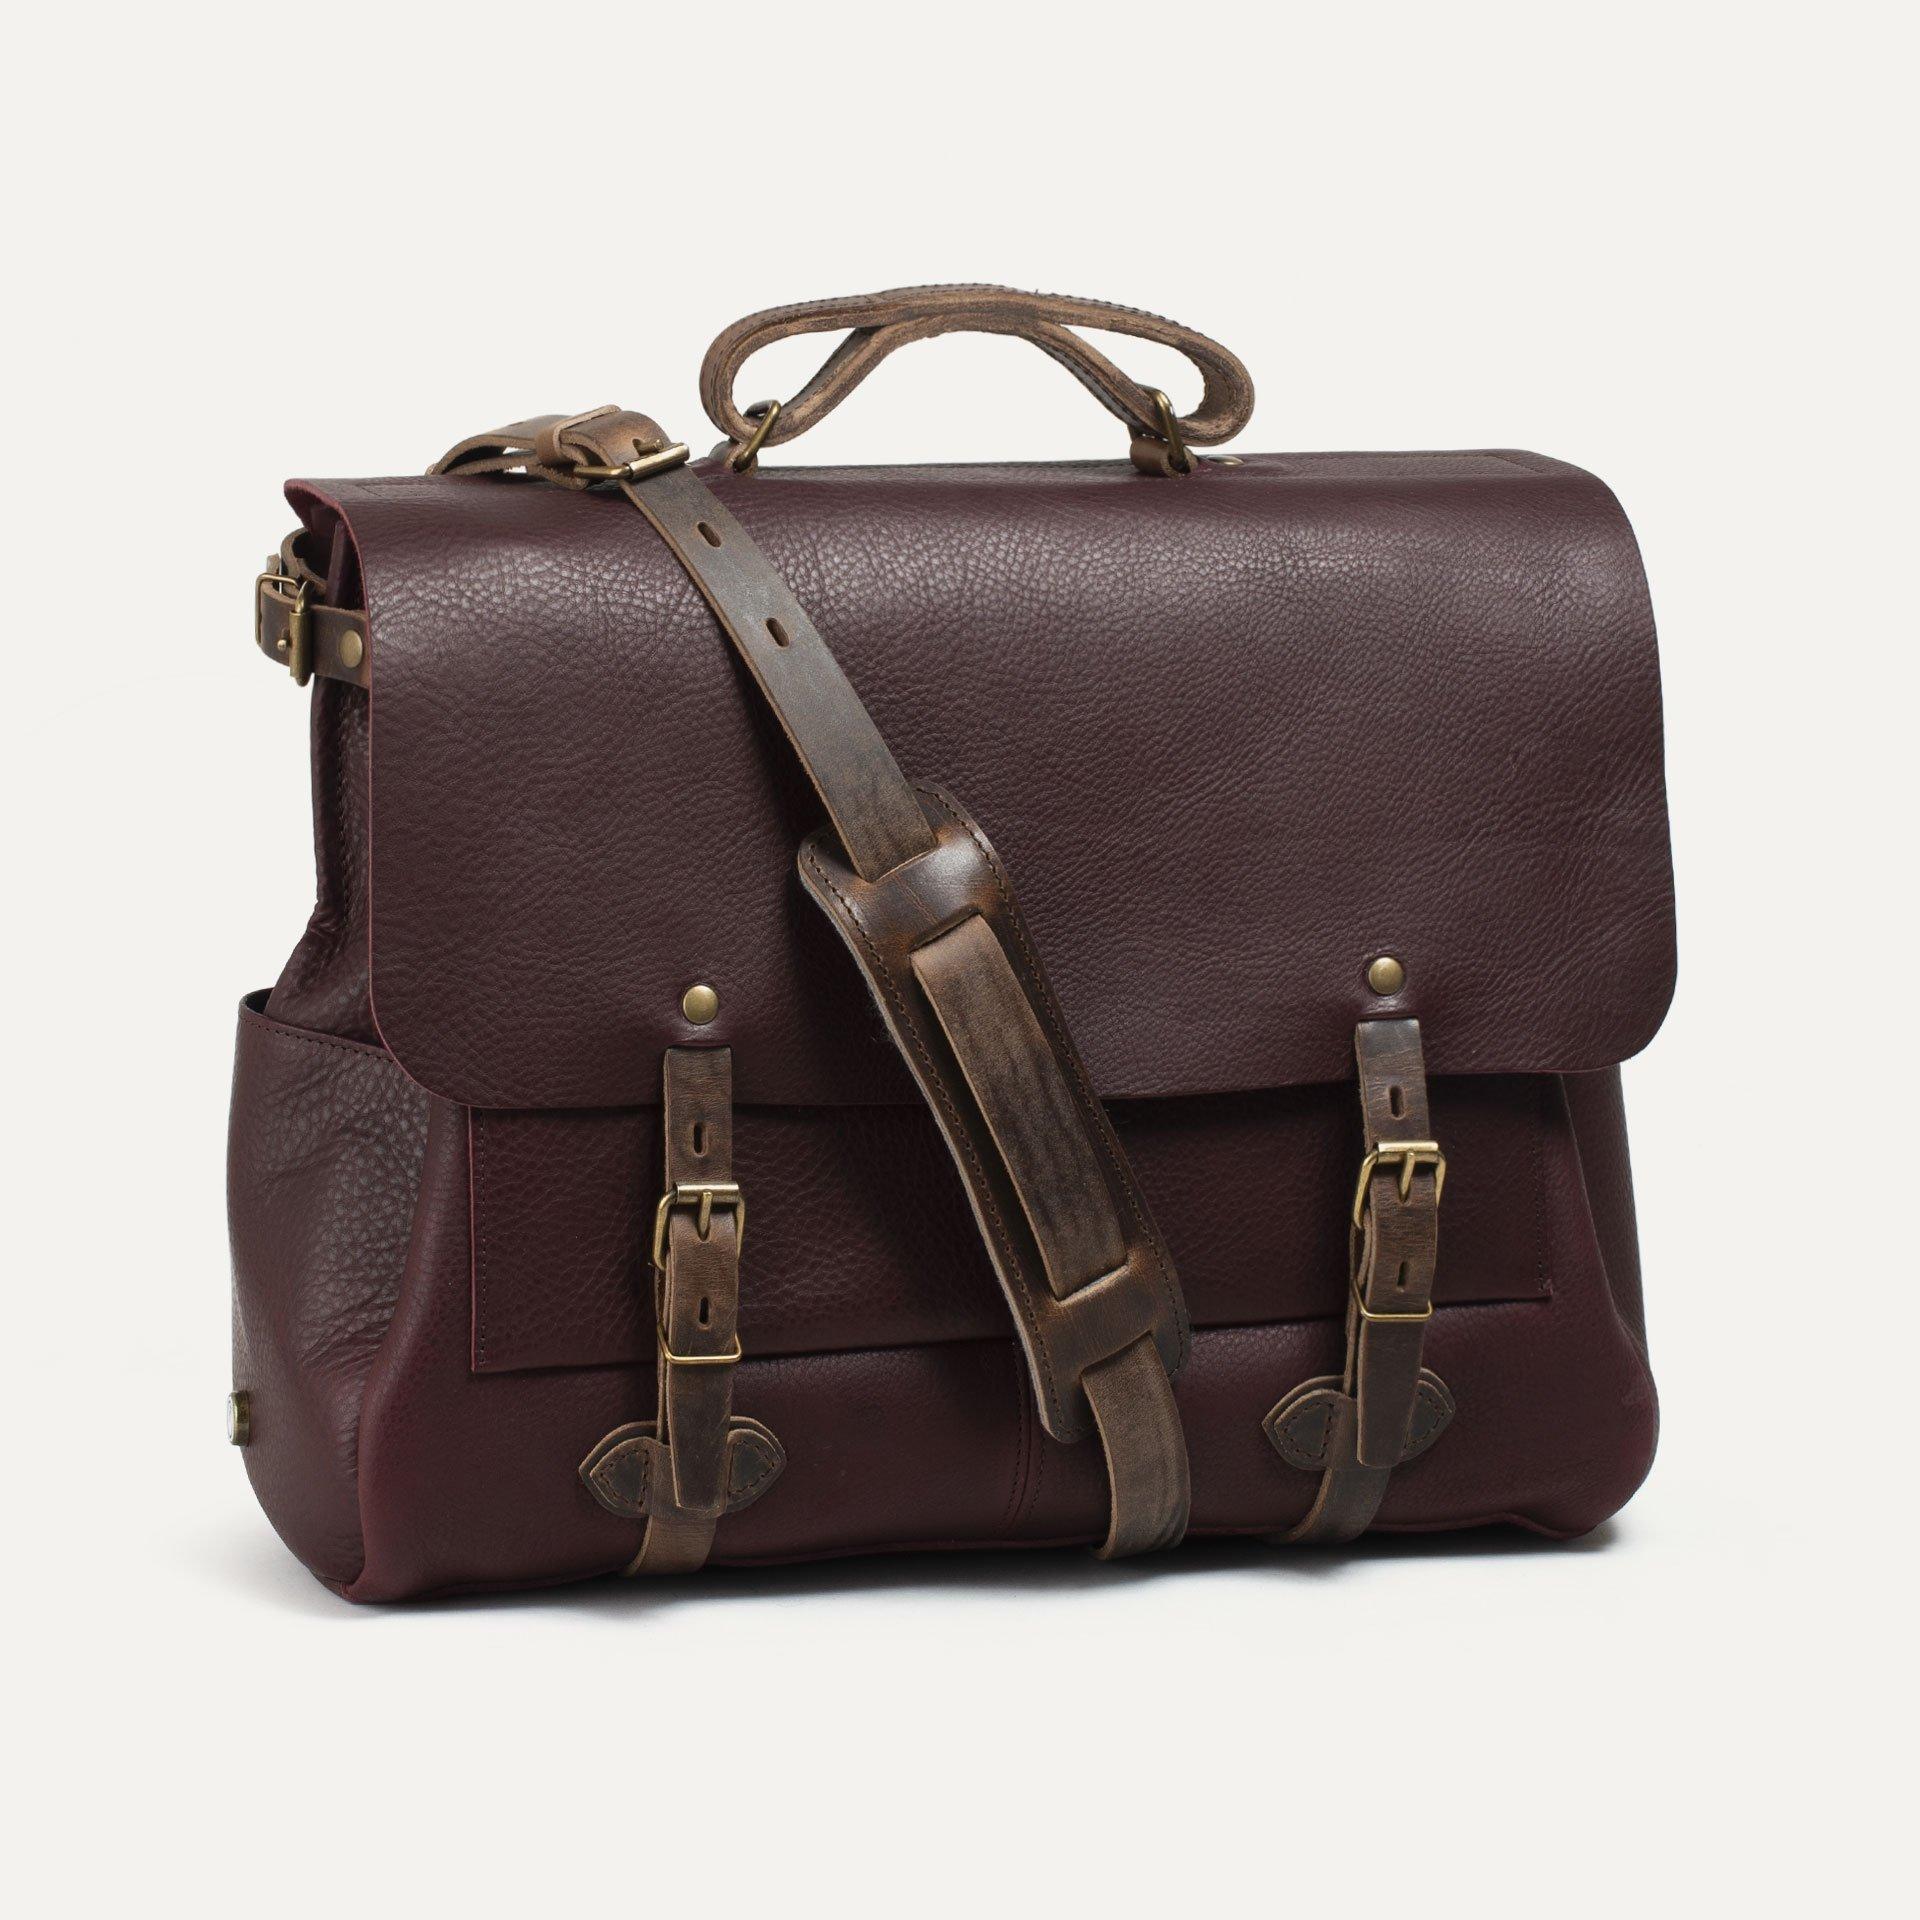 48h Irving Executive Postman bag - Peat (image n°2)